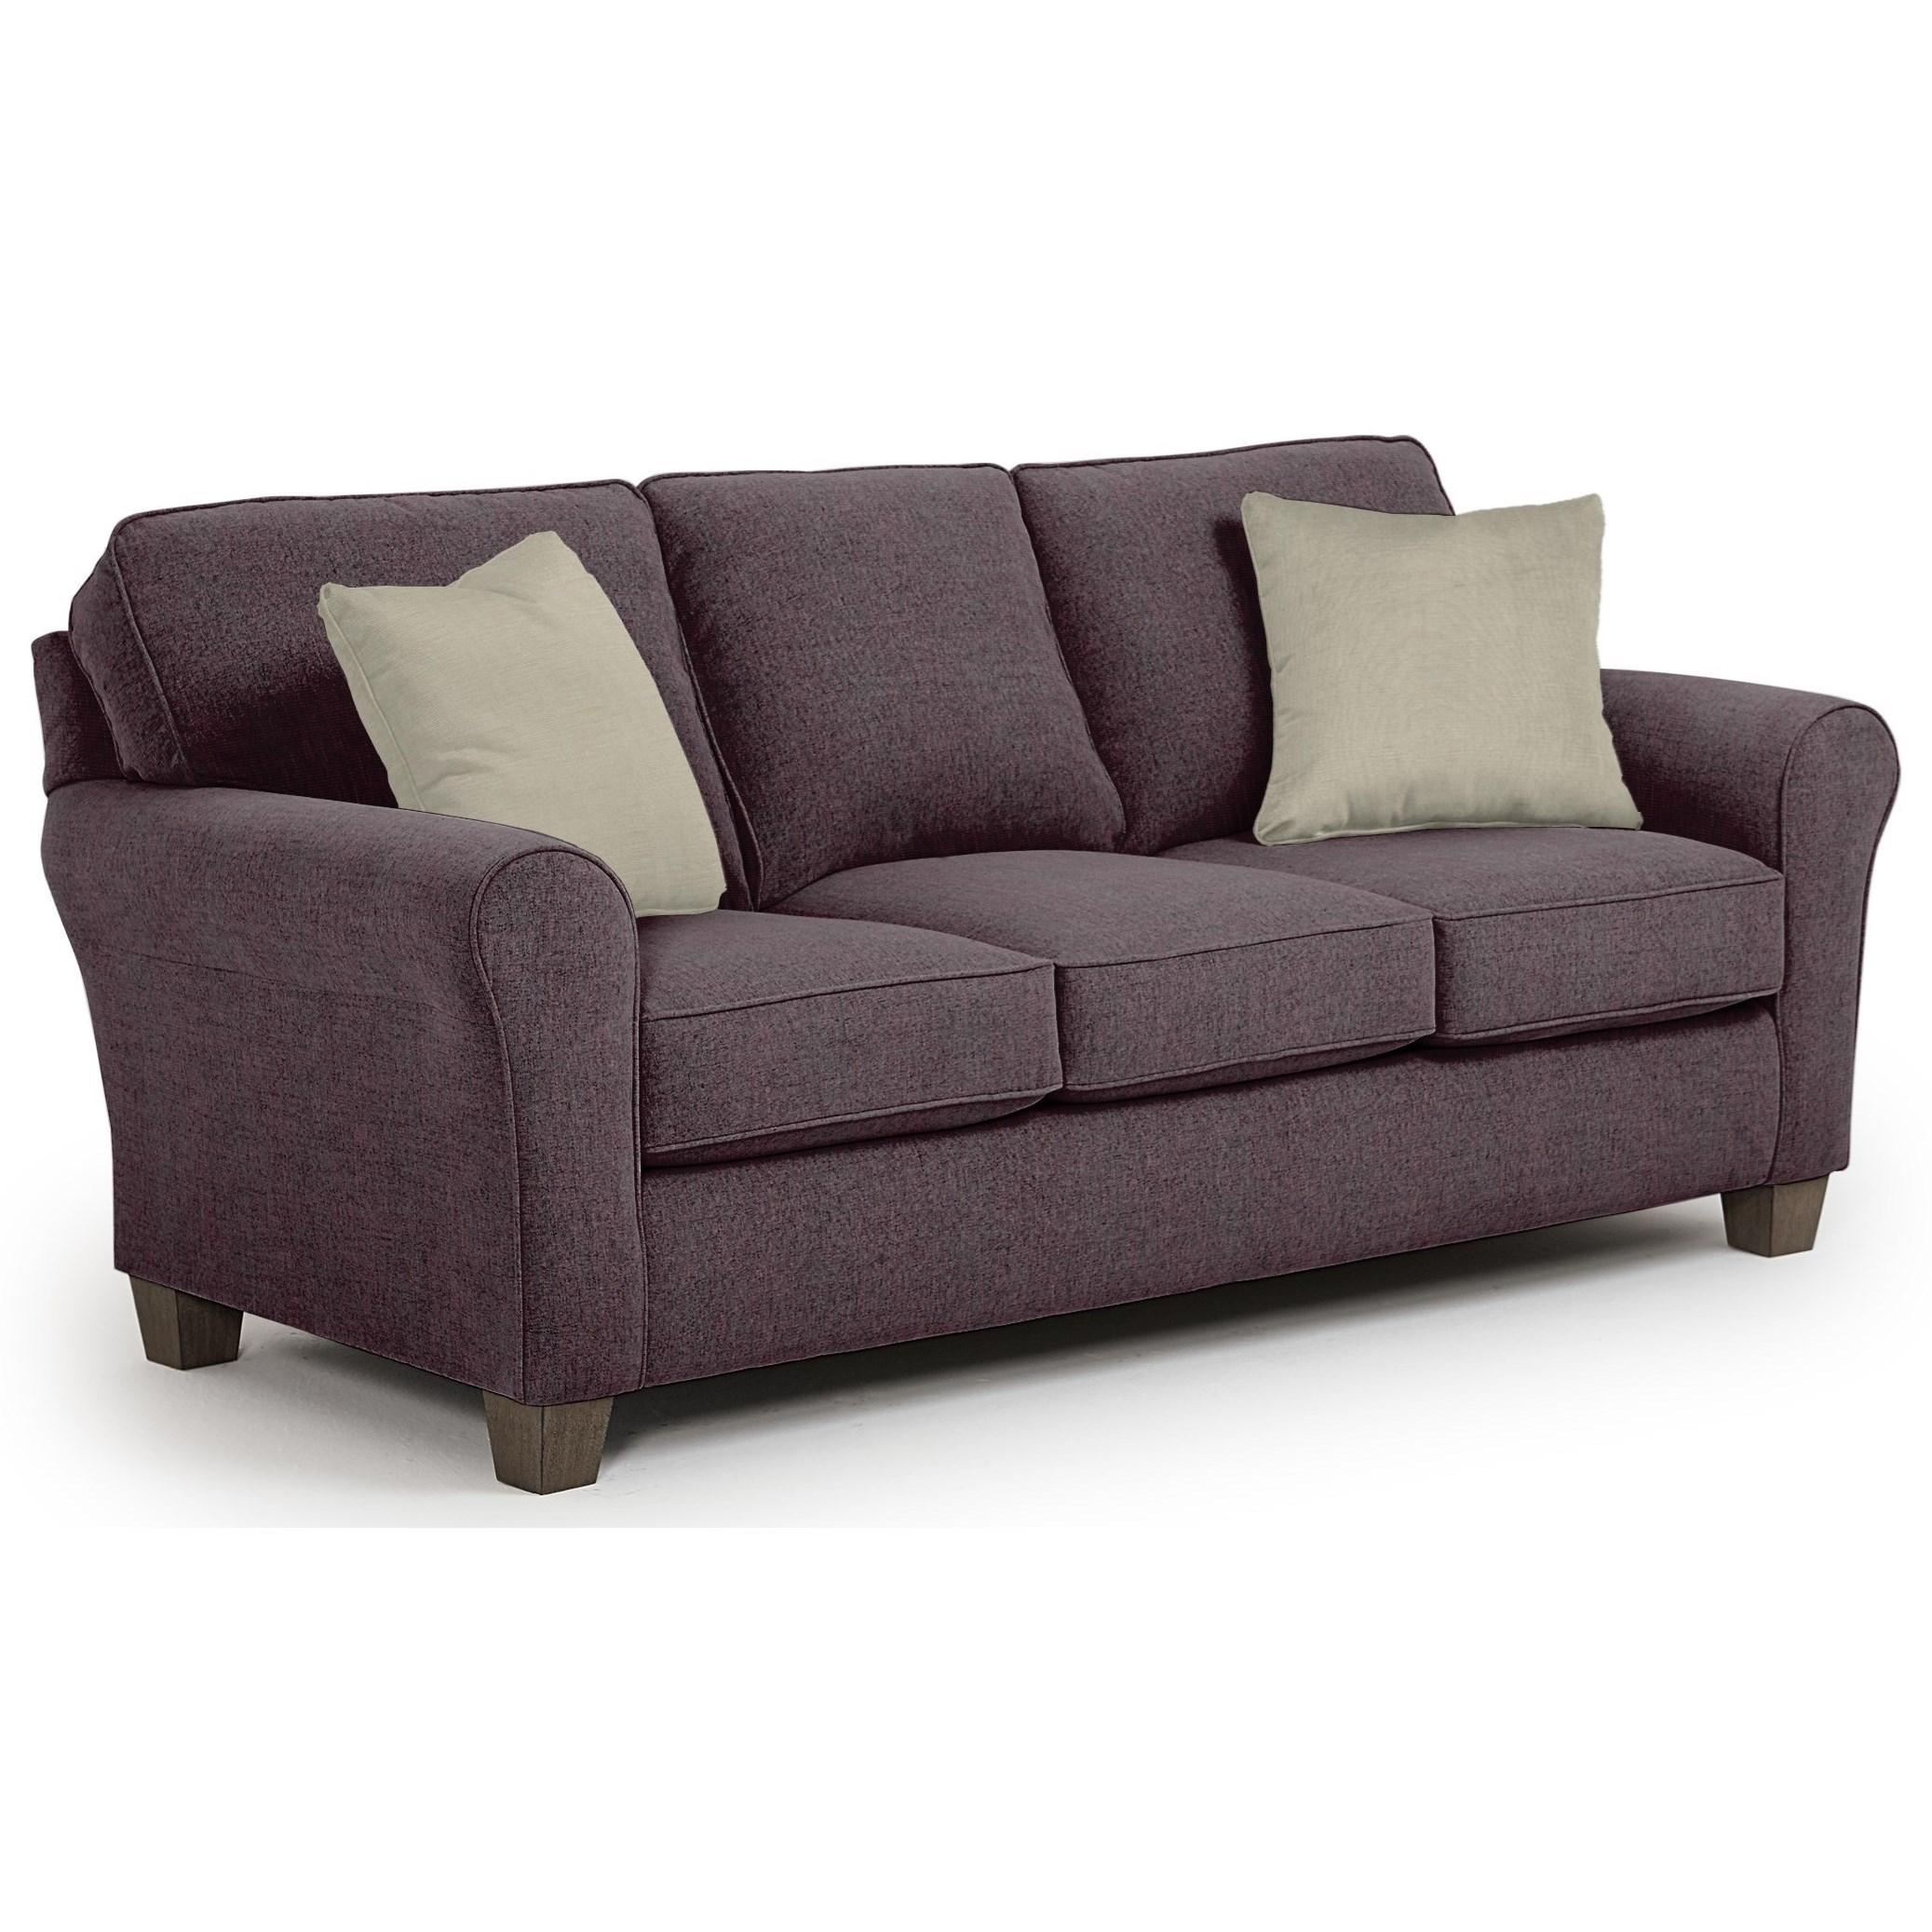 Best Home Furnishings Annabel  <b>Custom</b> 3 Over 3 Sofa - Item Number: 95361869-22868